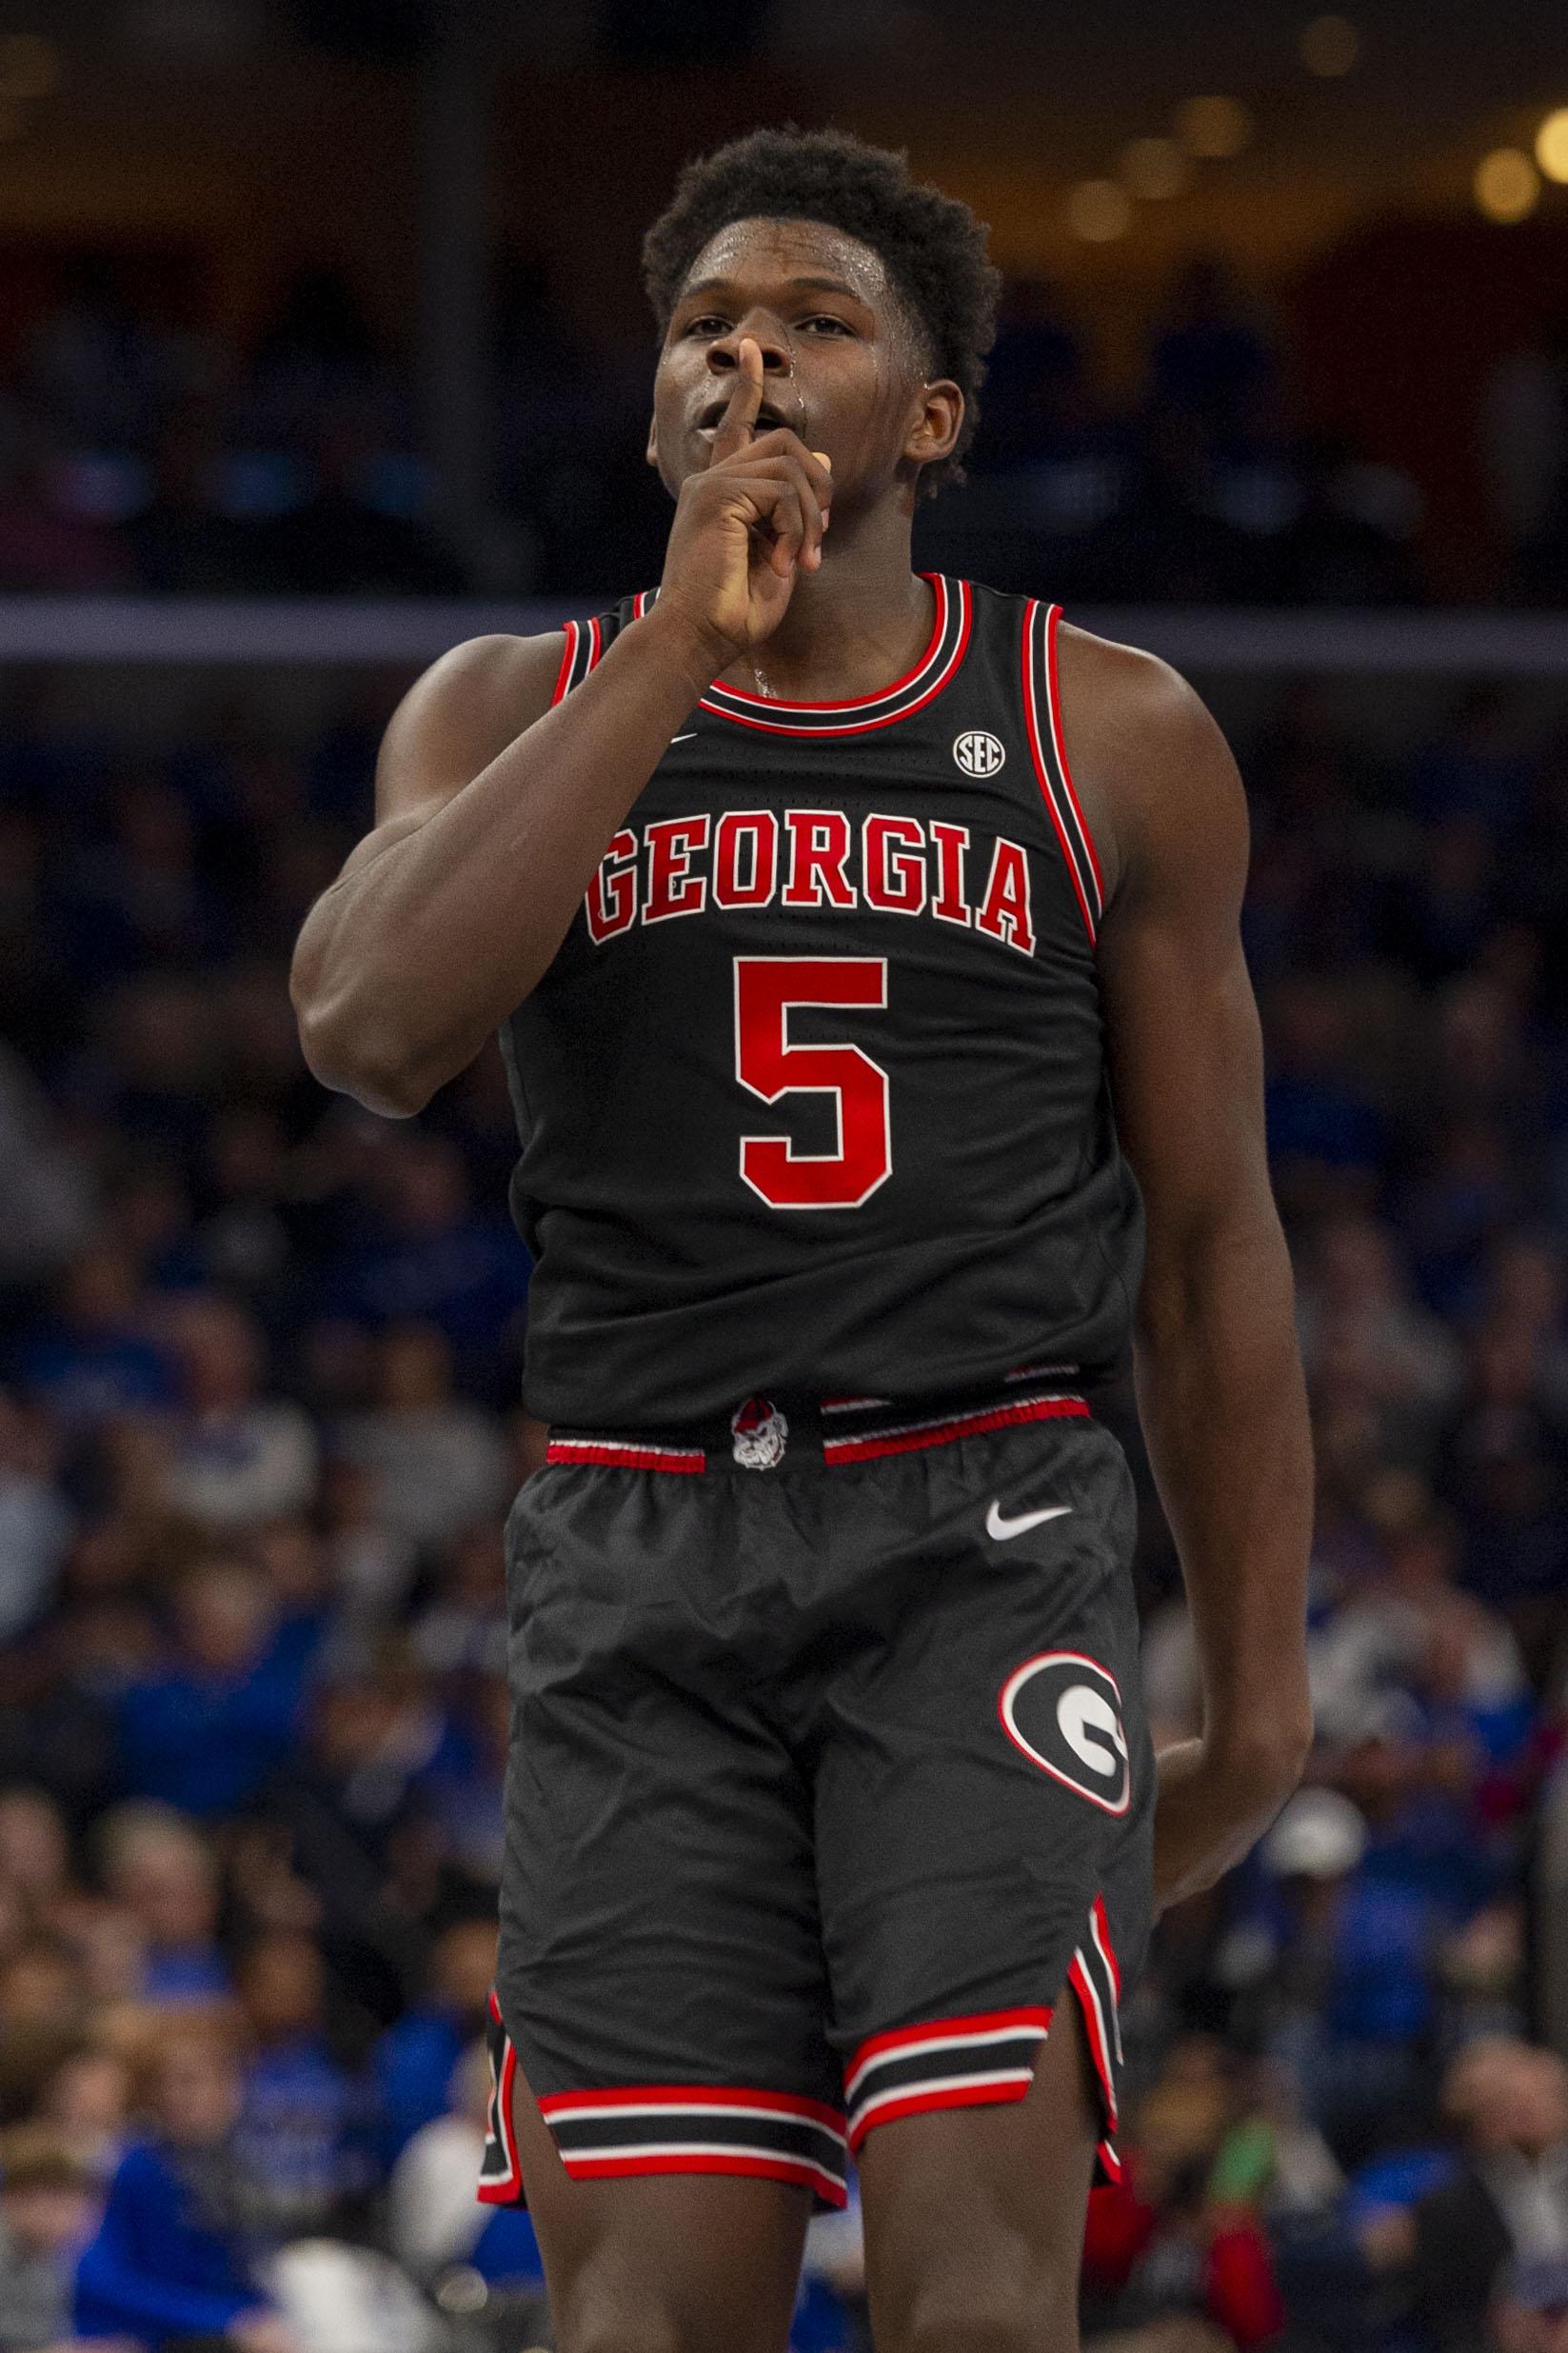 NCAA Basketball: Georgia at Memphis